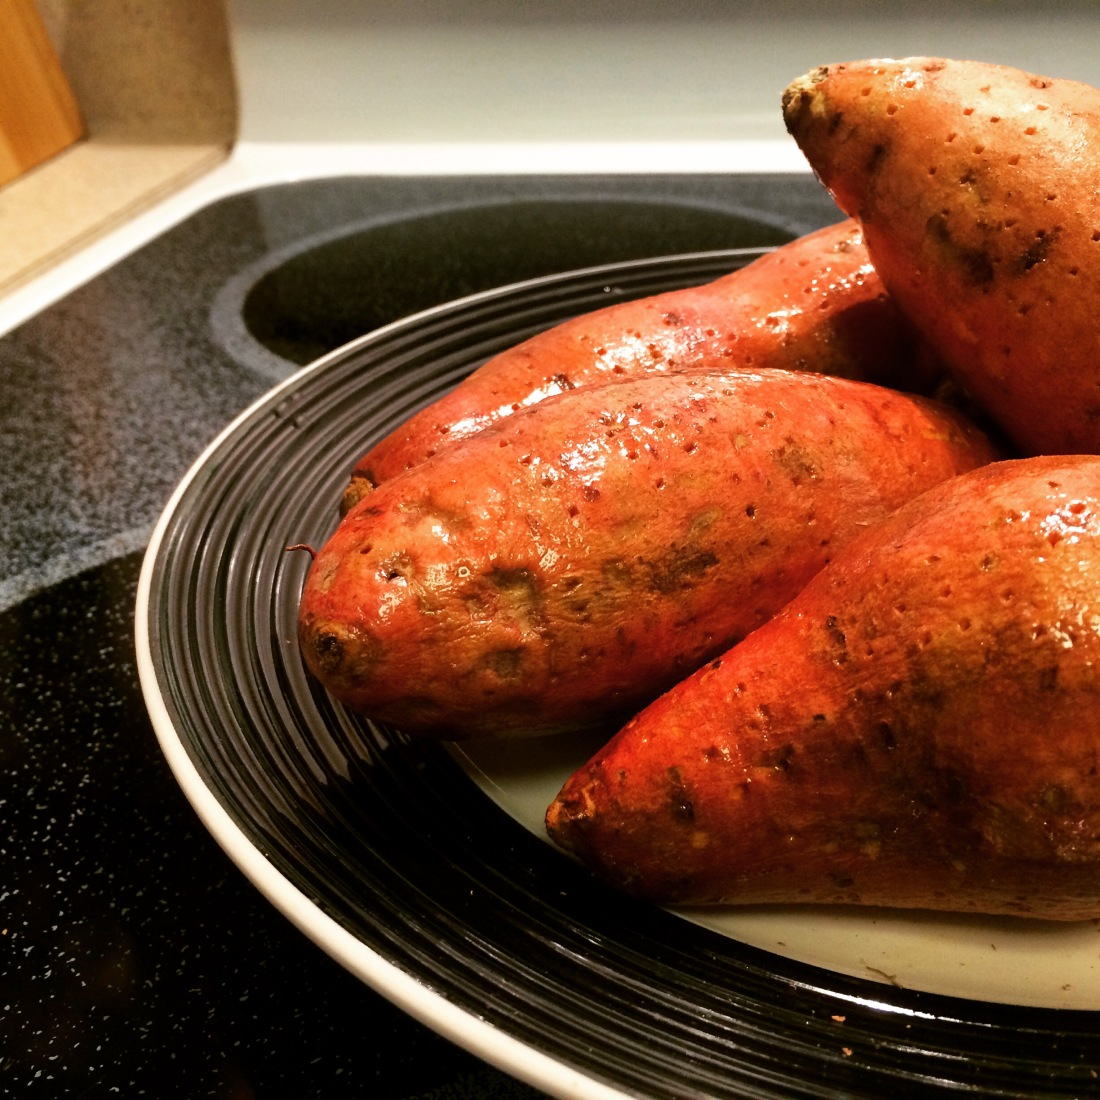 A few sweet potatoes waiting for their aluminum foil coat.